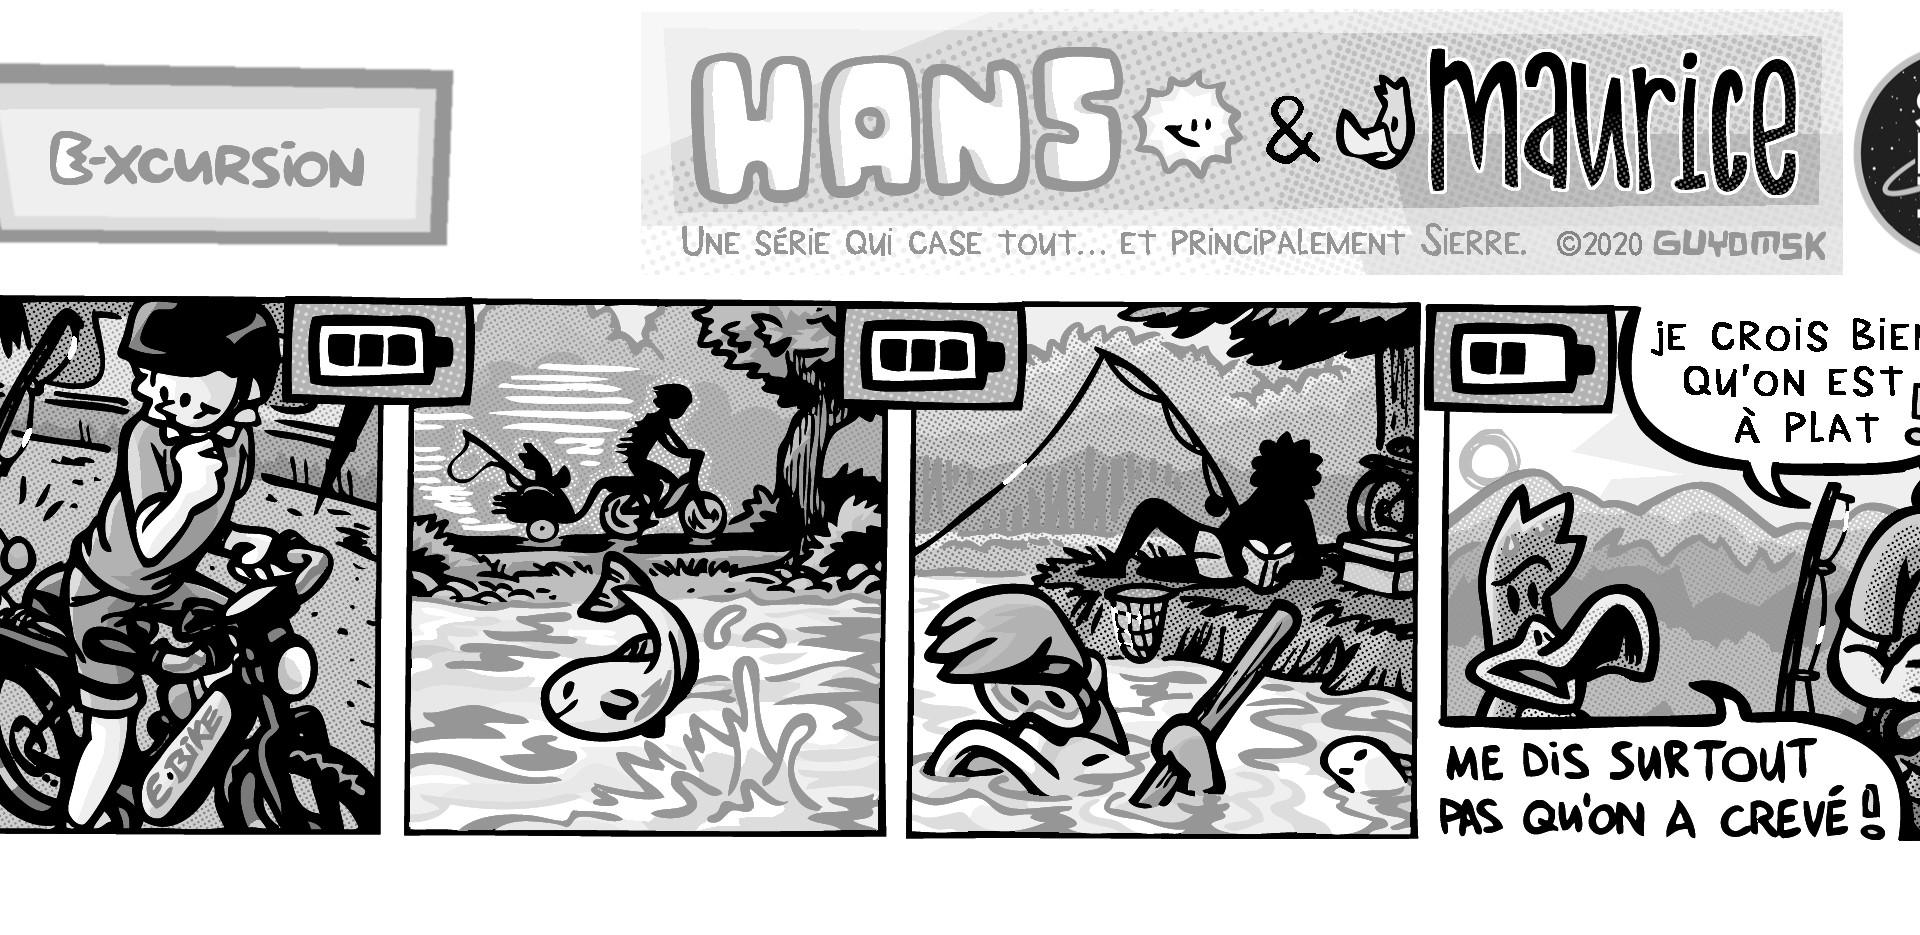 Hans & Maurice